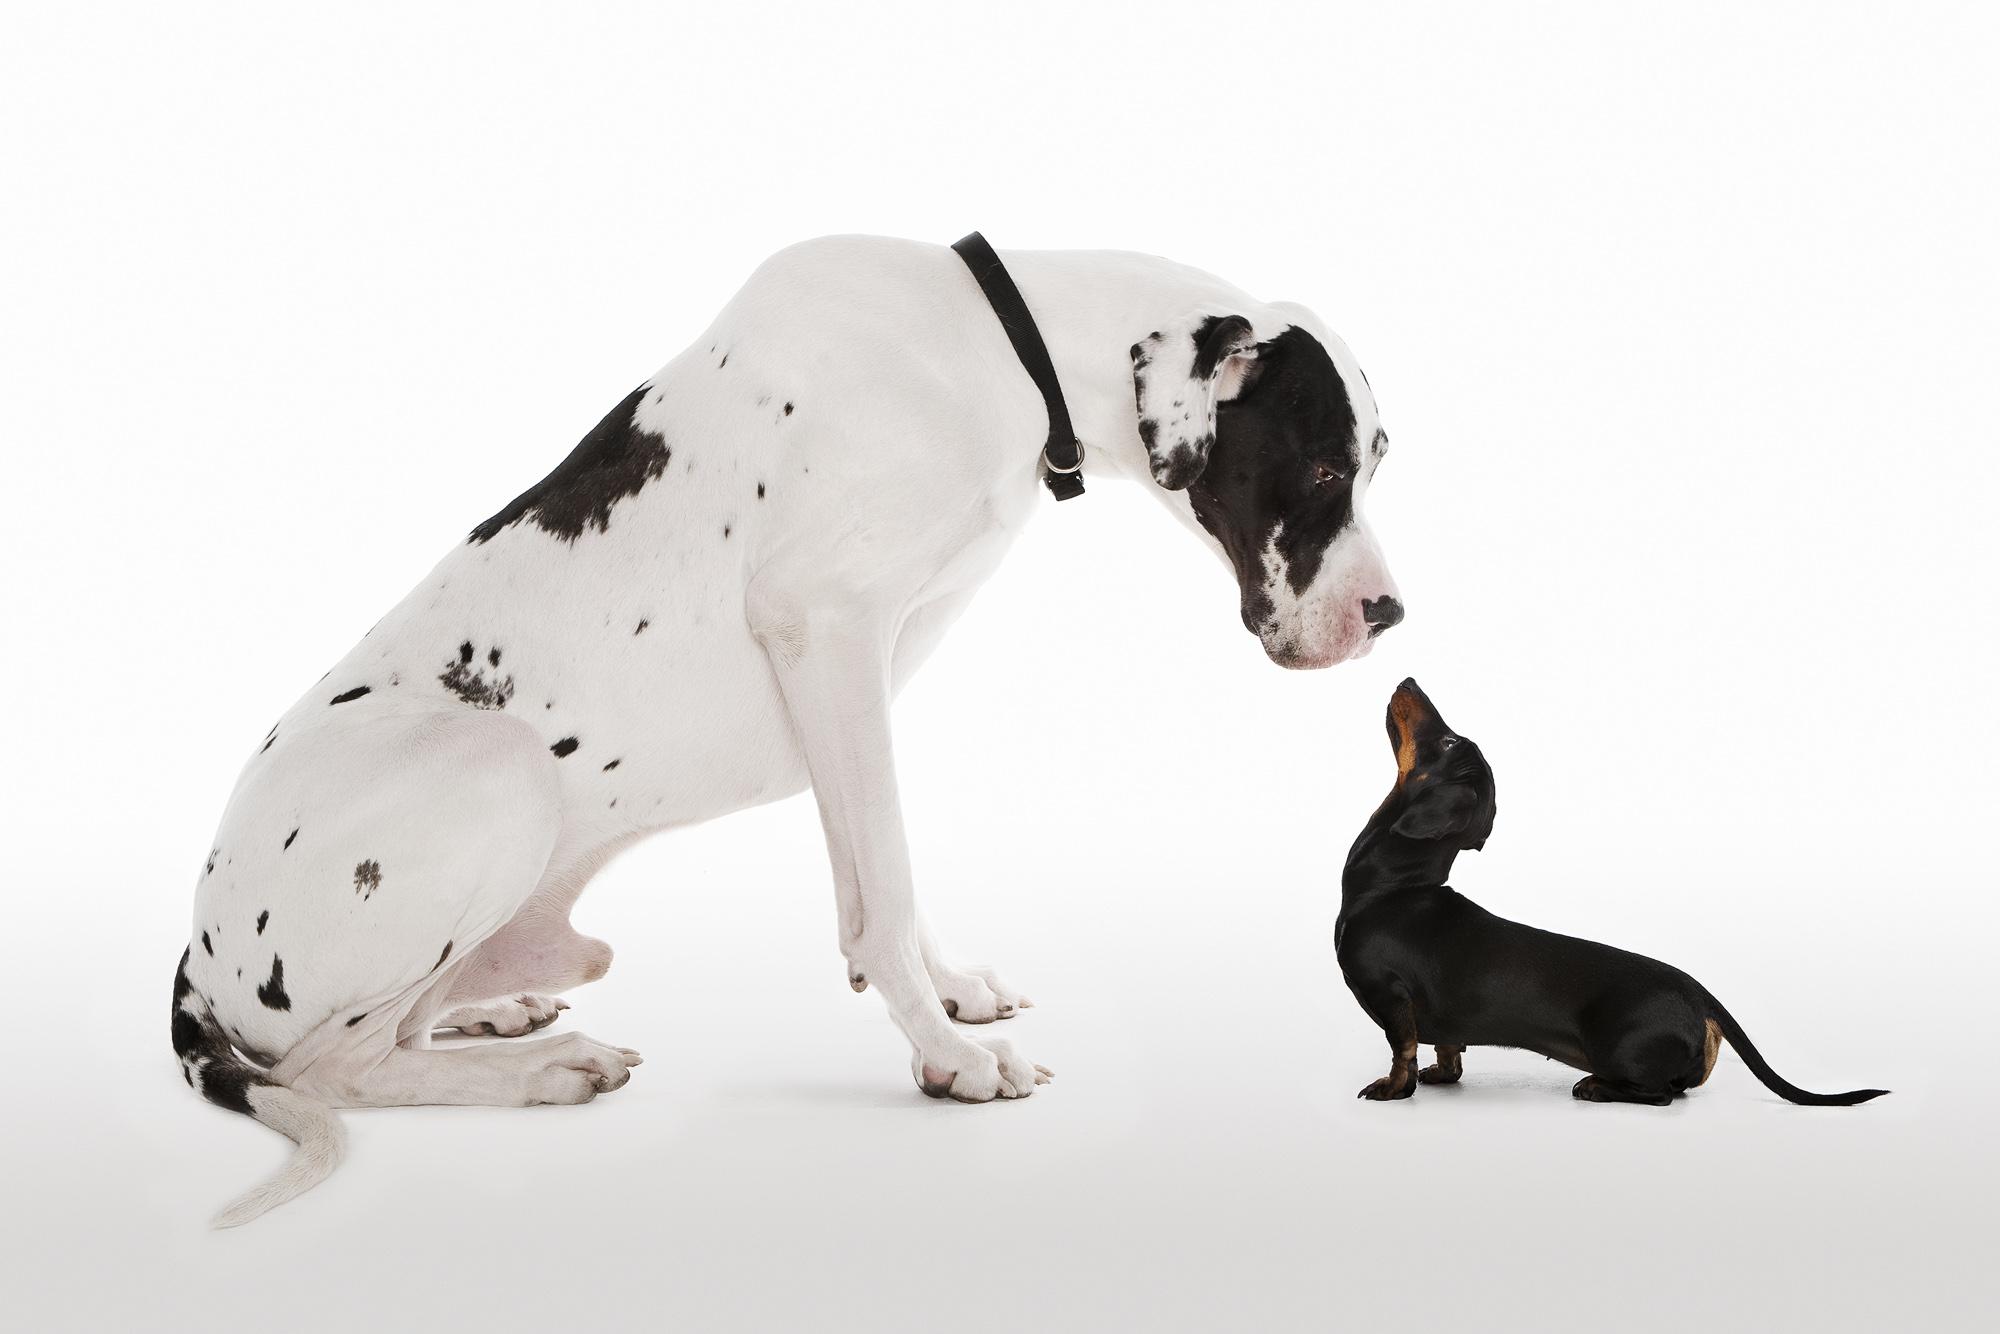 Tim Platt - profile of two dogs